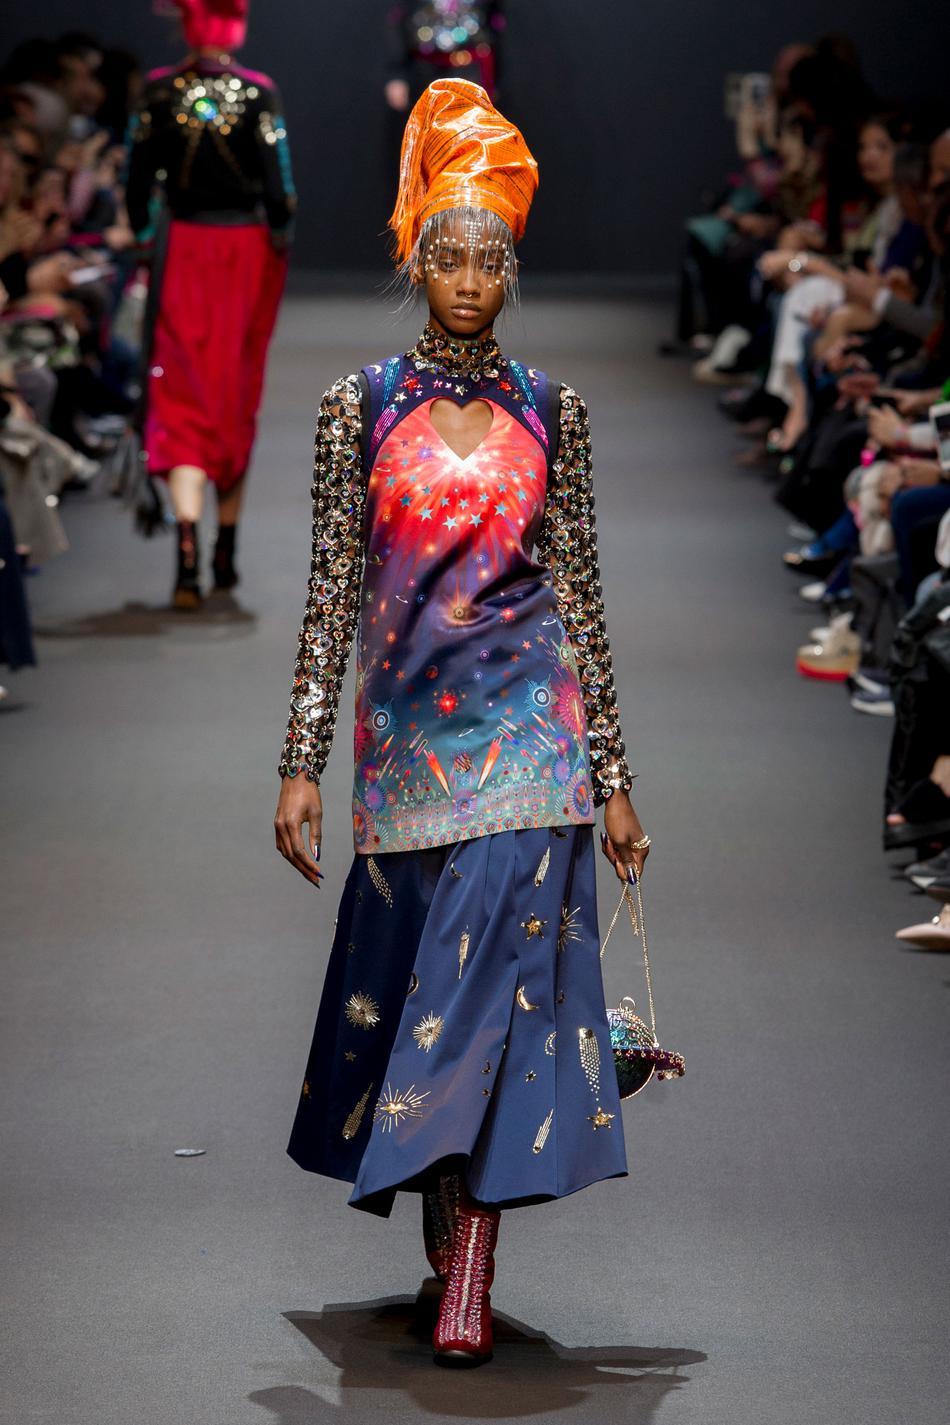 Défilé Manish Arora Fashion Week 2017 - Look 26